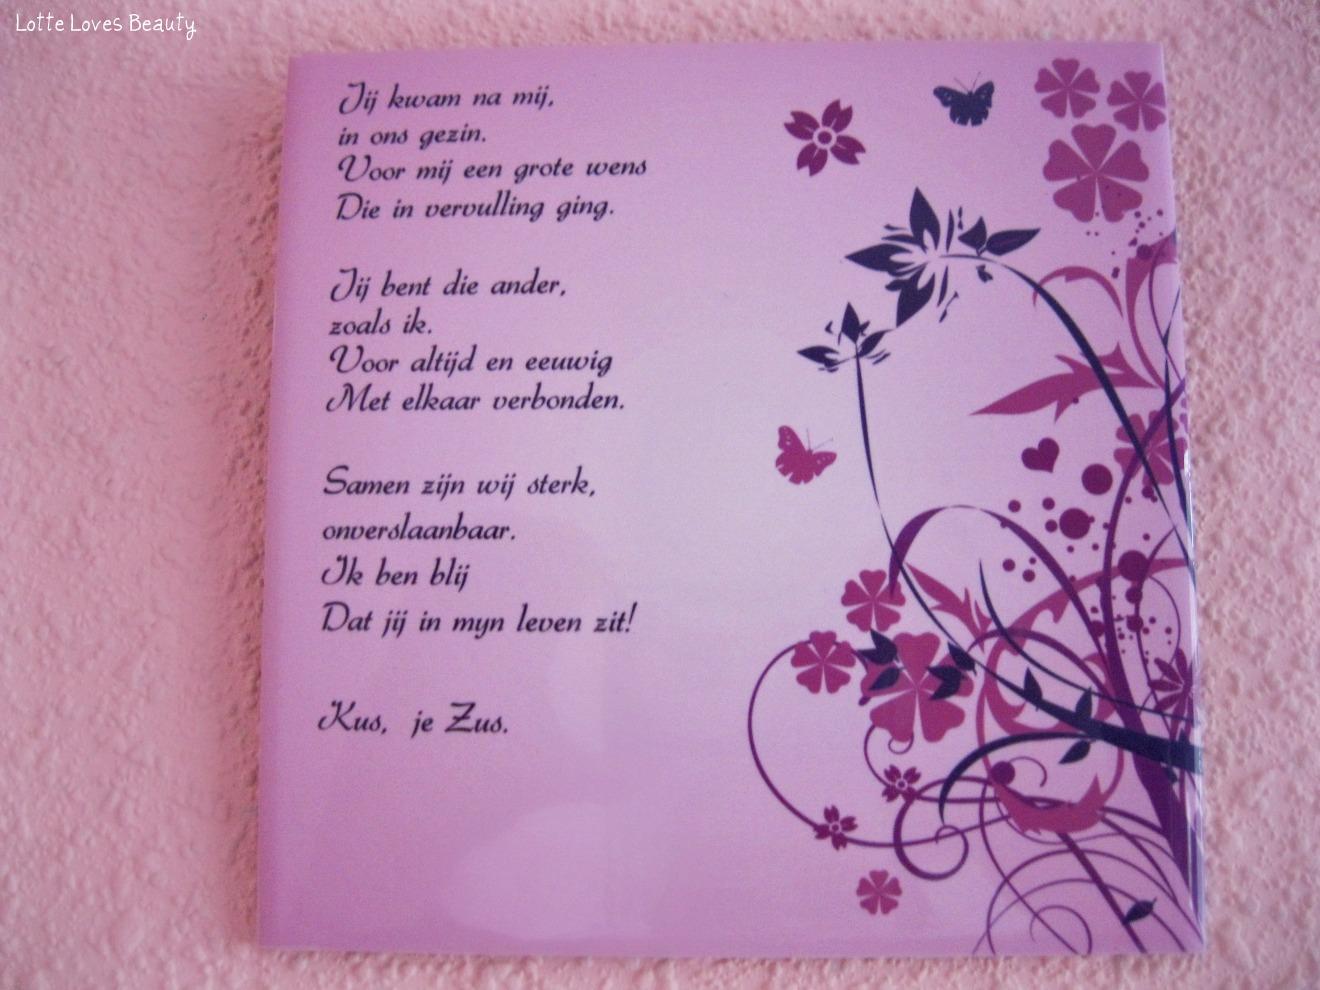 Fonkelnieuw Korte Gedichten Zus | clarasandragina news MJ-52